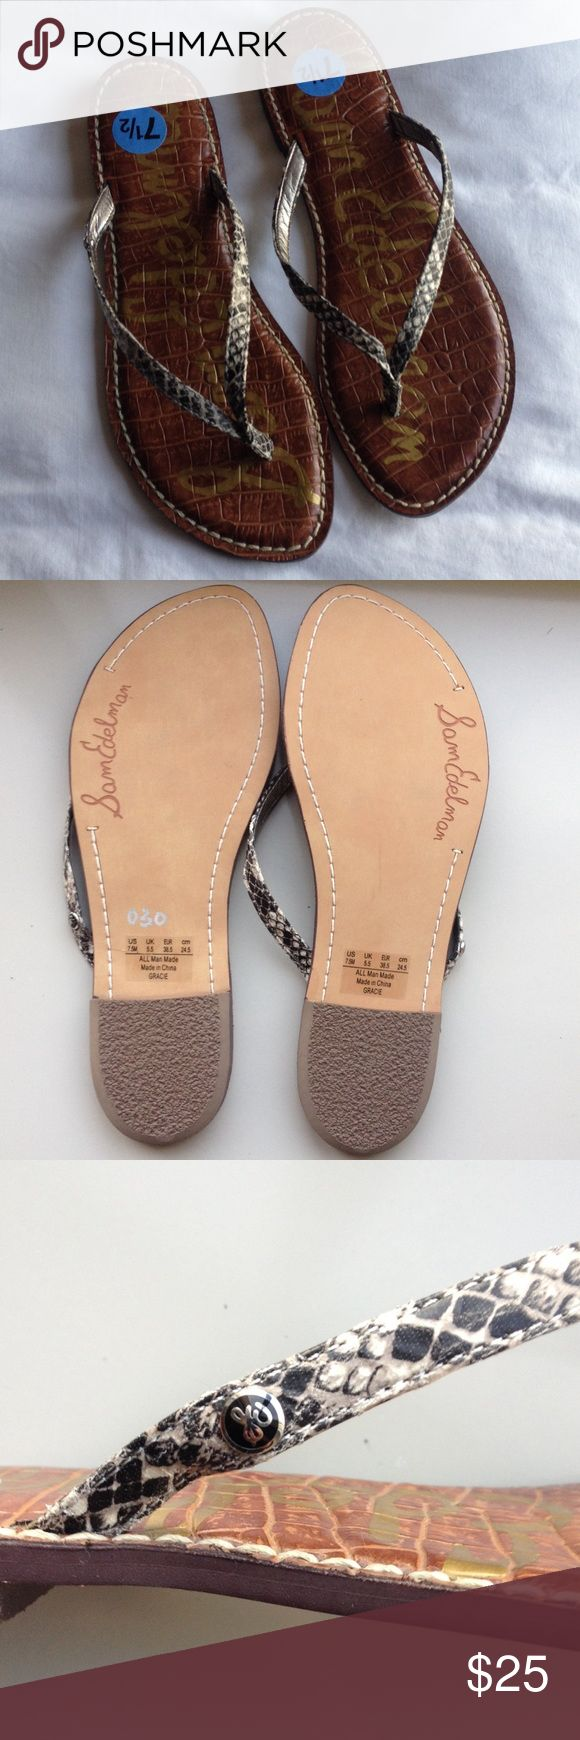 (NEW) Sam Edelman Snakeskin Flip Flops (New). Never worn. No tag. Size: 7 1/2 M. Snakeskin accent. No box. Ready to ship! Sam Edelman  Shoes